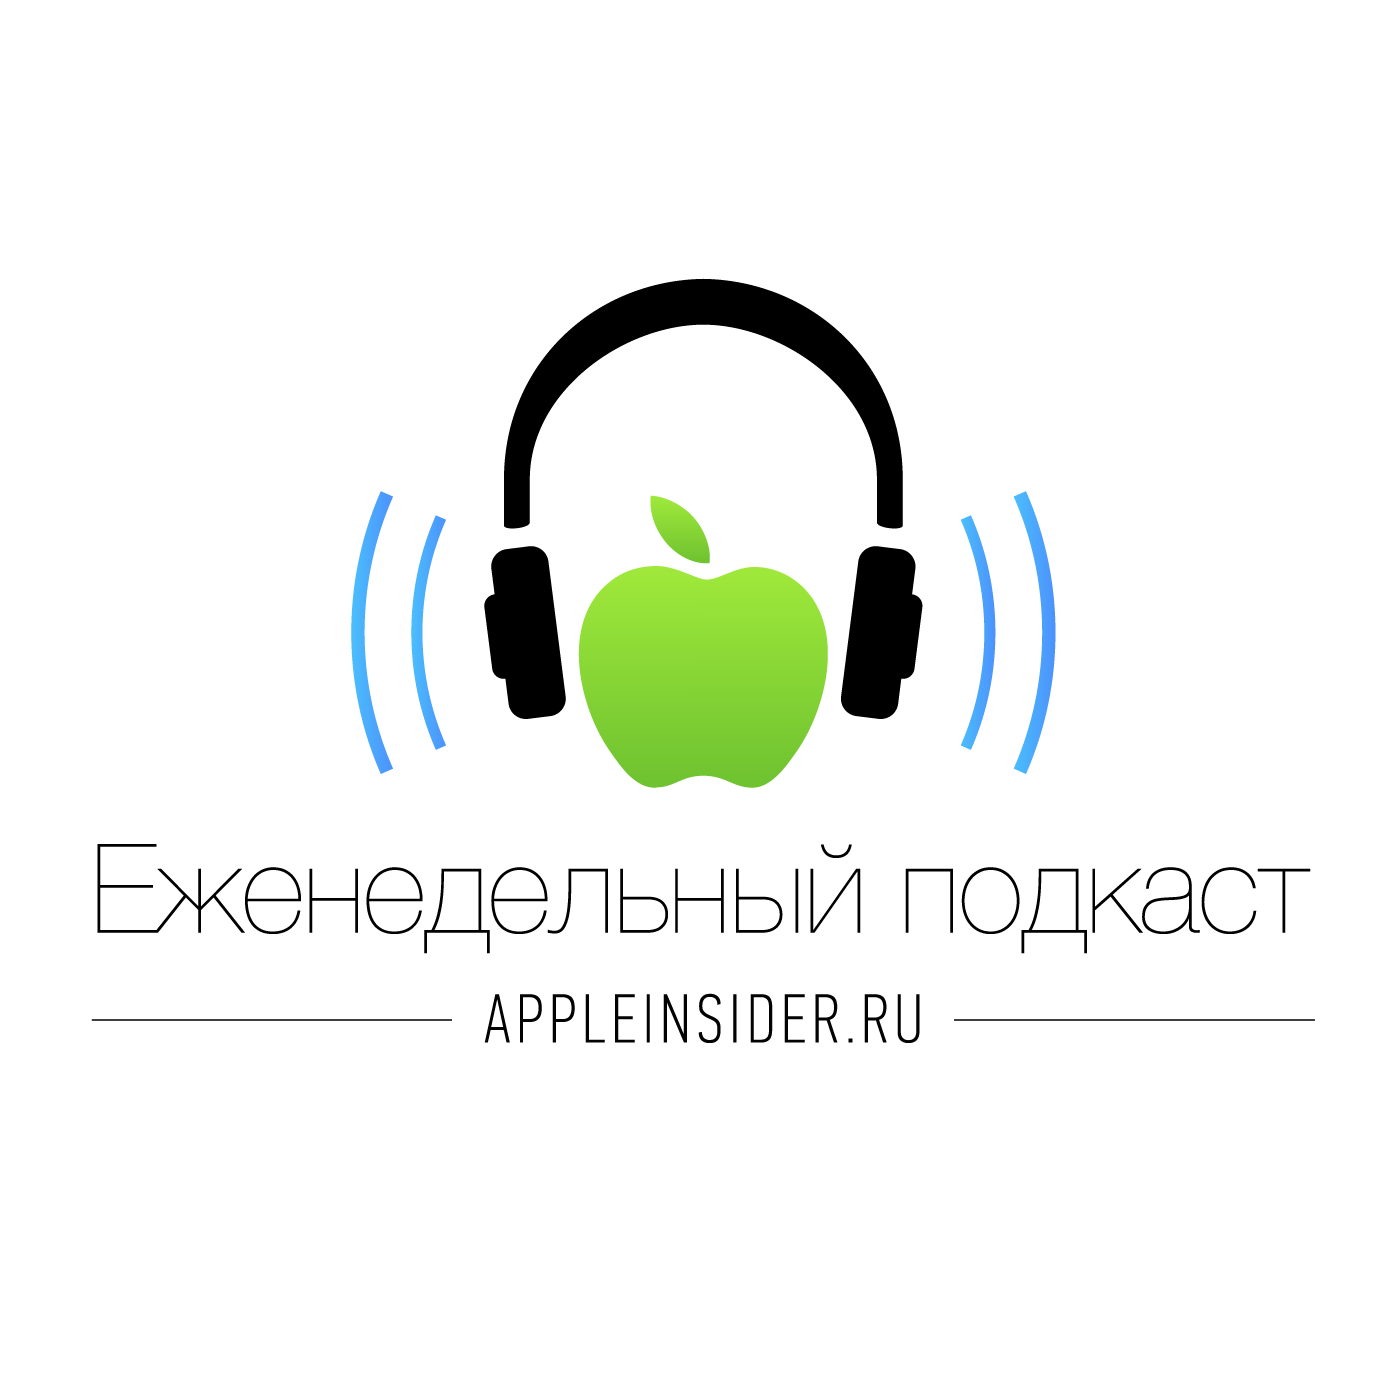 Миша Королев NOKIA 3310 зу partner nokia 3310